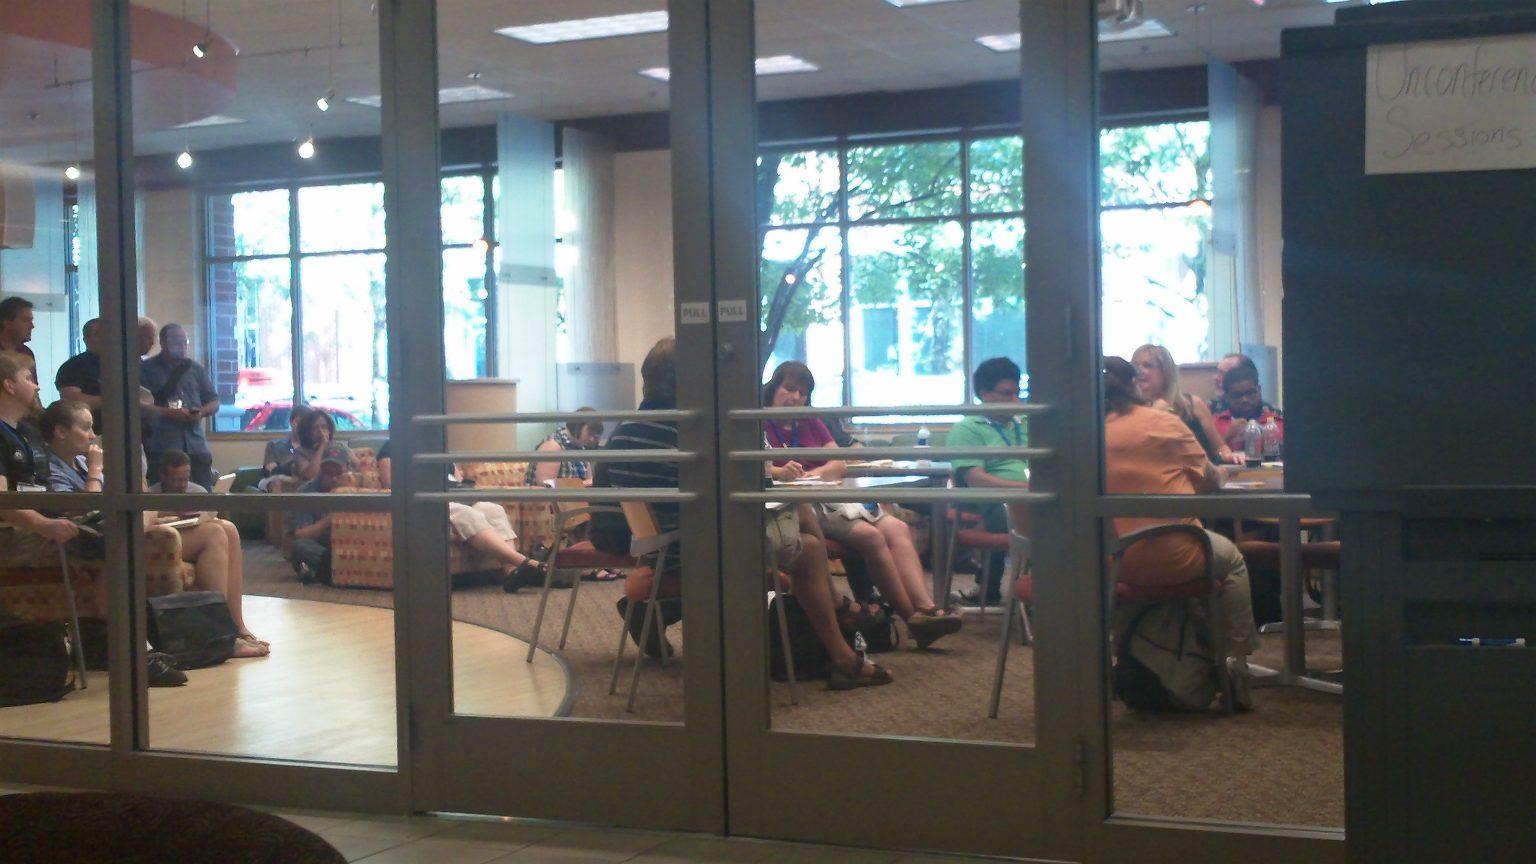 People sitting in a room behind glass doors